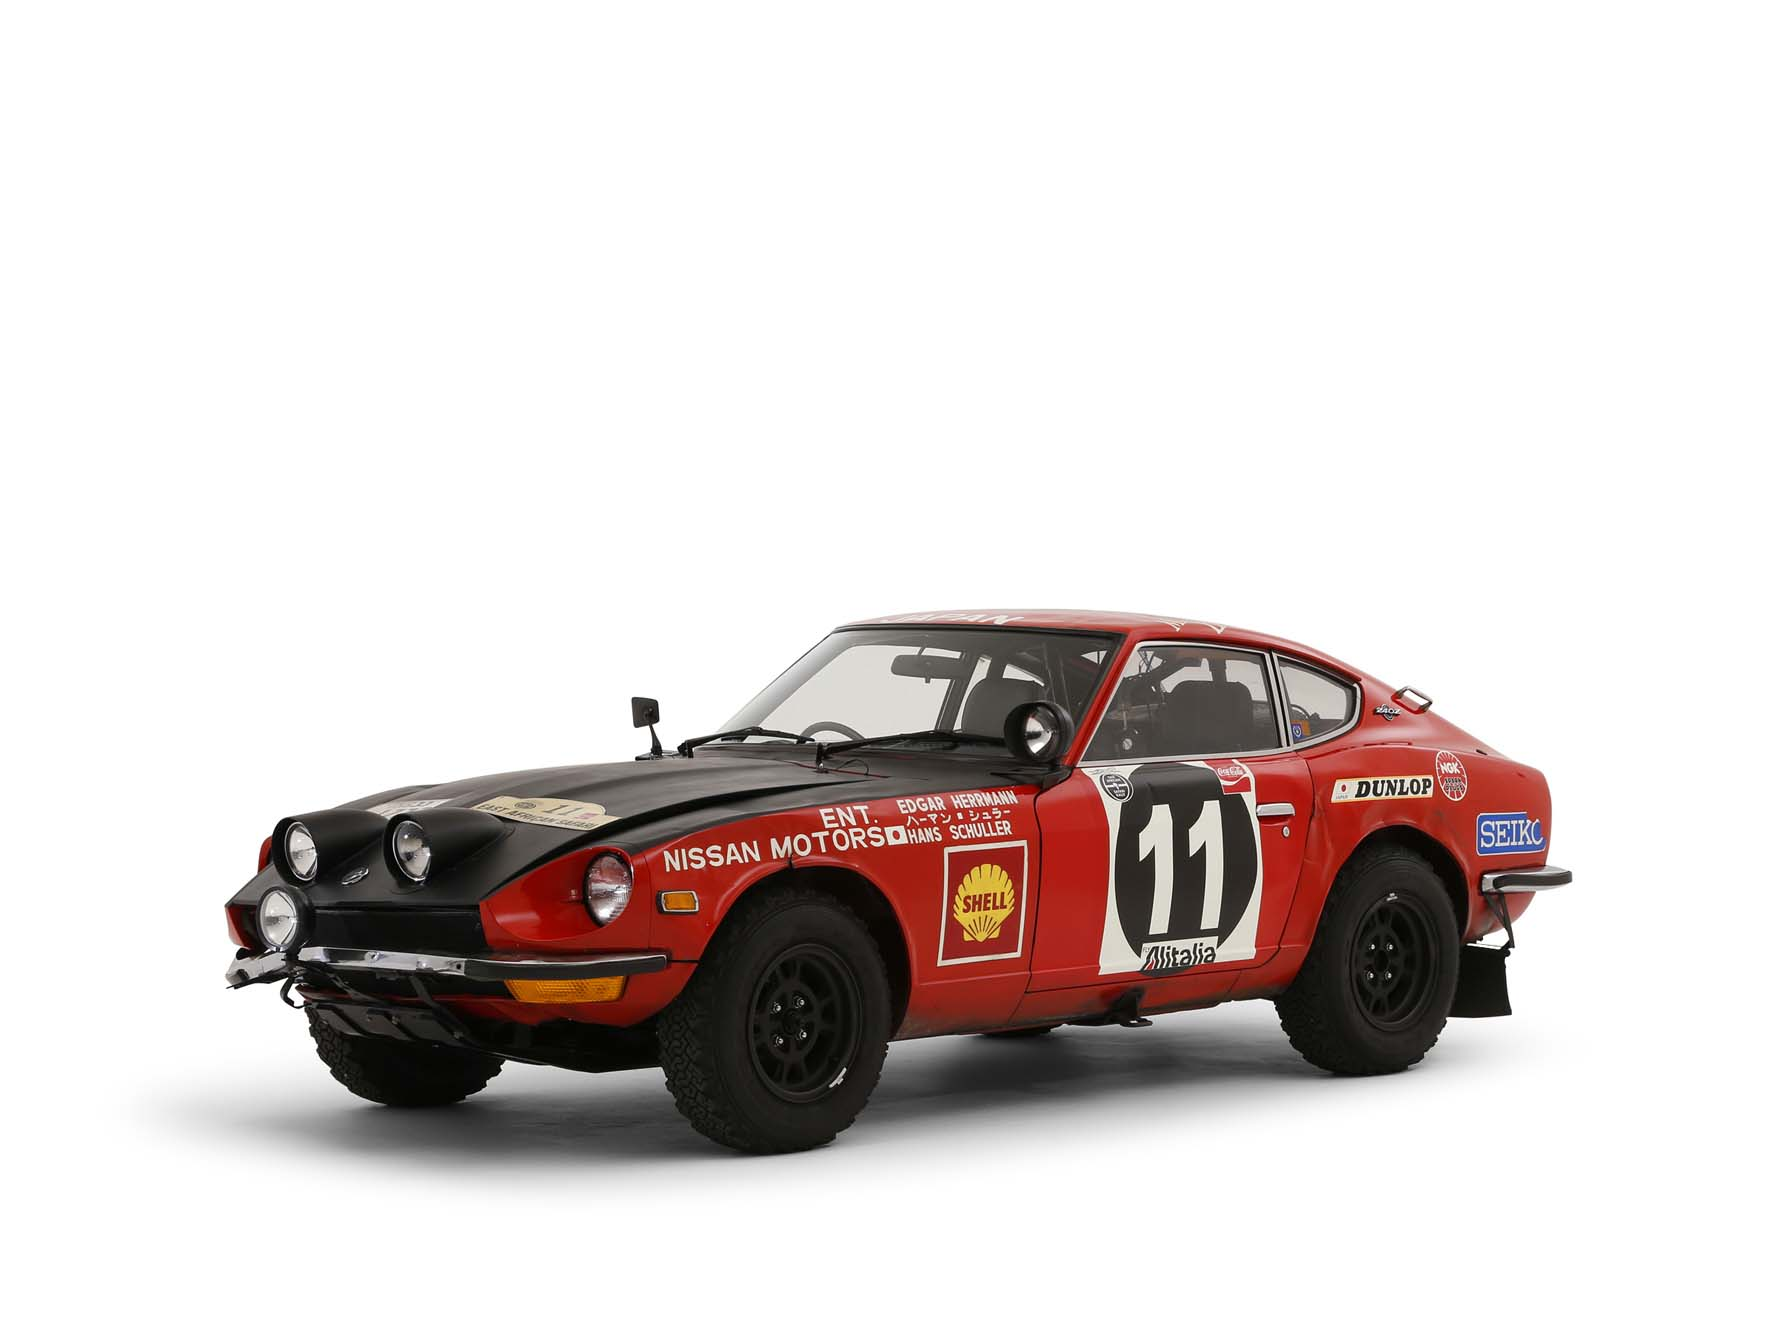 Datsun 240Z High Πώς σου φαίνεται αυτό το Nissan Juke Rally; Nissan, Nissan Juke, zblog, ειδήσεις, Νέα